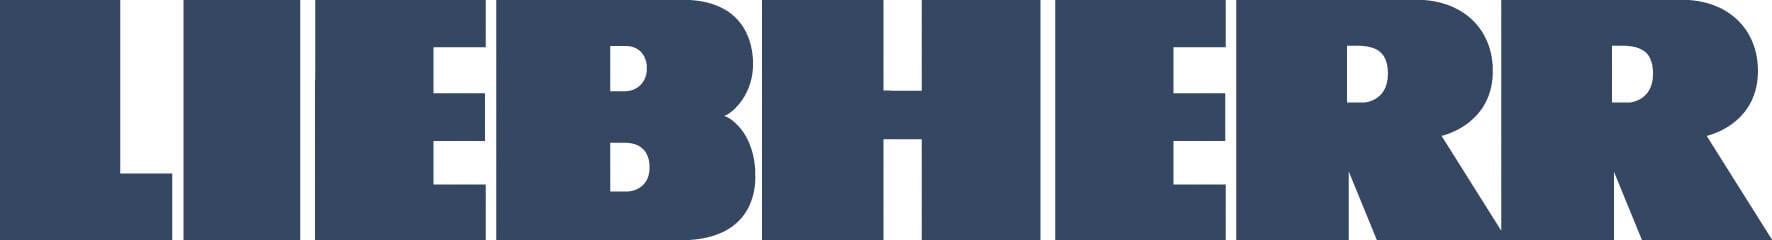 Le logo de Liebherr